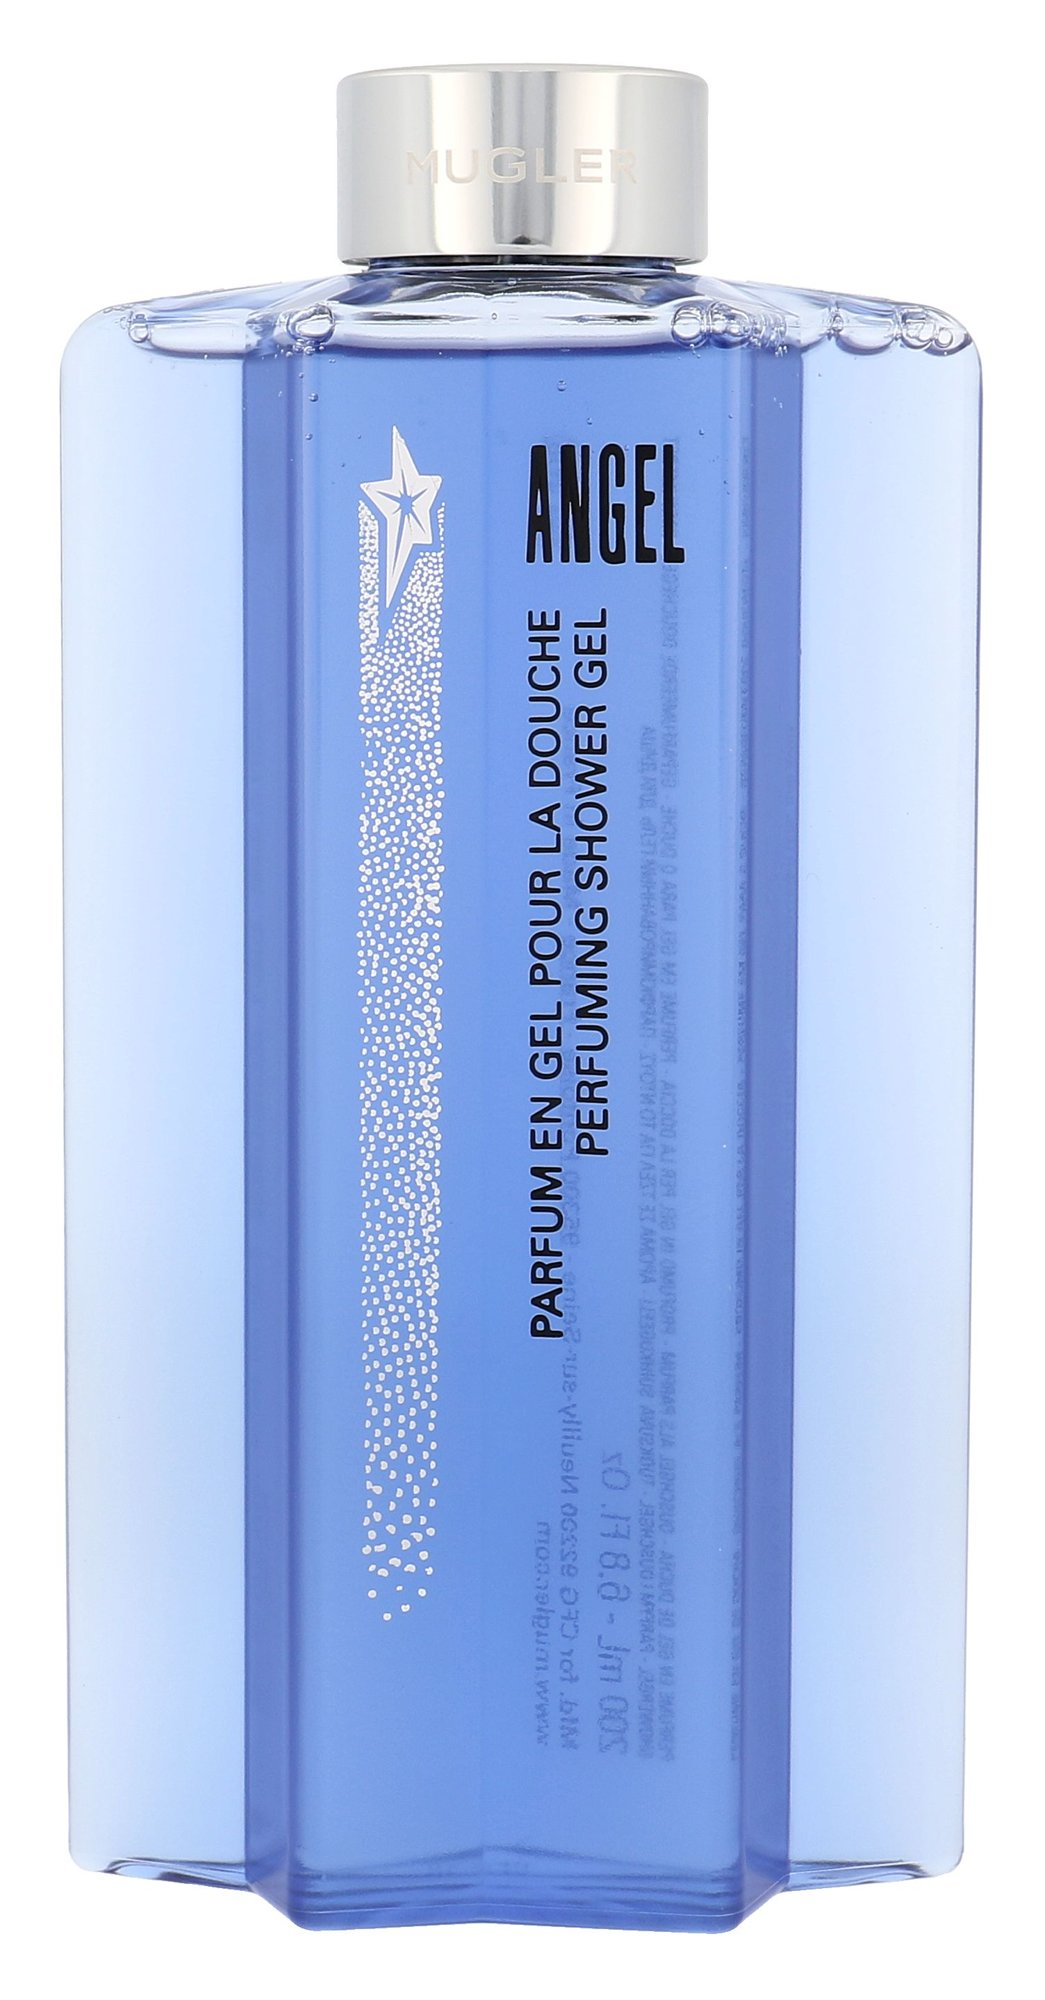 Thierry Mugler Angel Shower gel 200ml